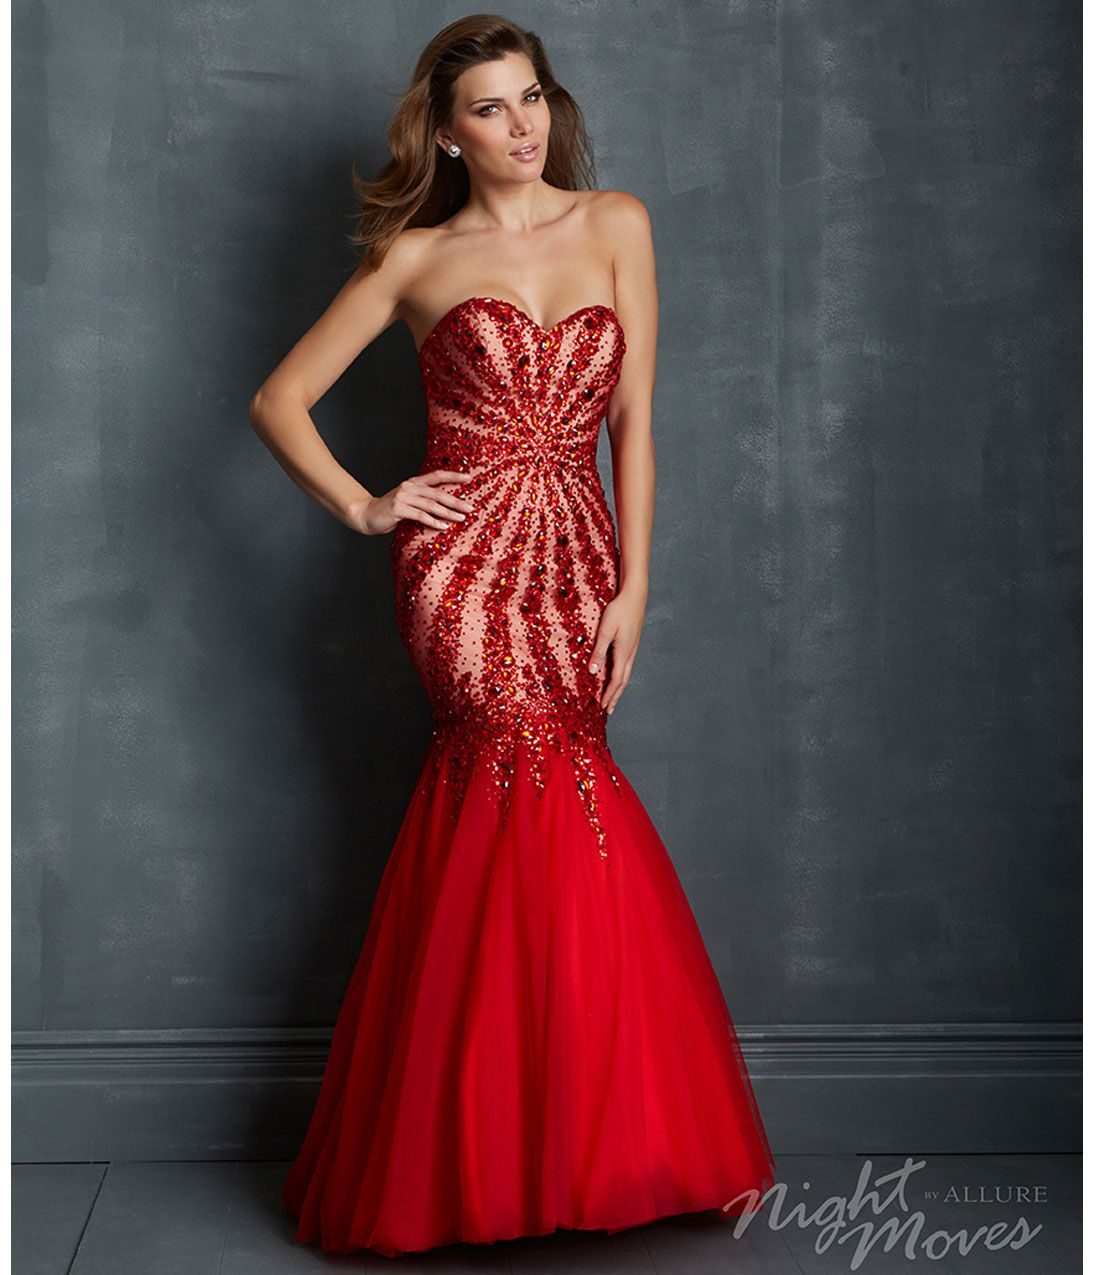 Red Mermaid Dress Prom - Ocodea.com